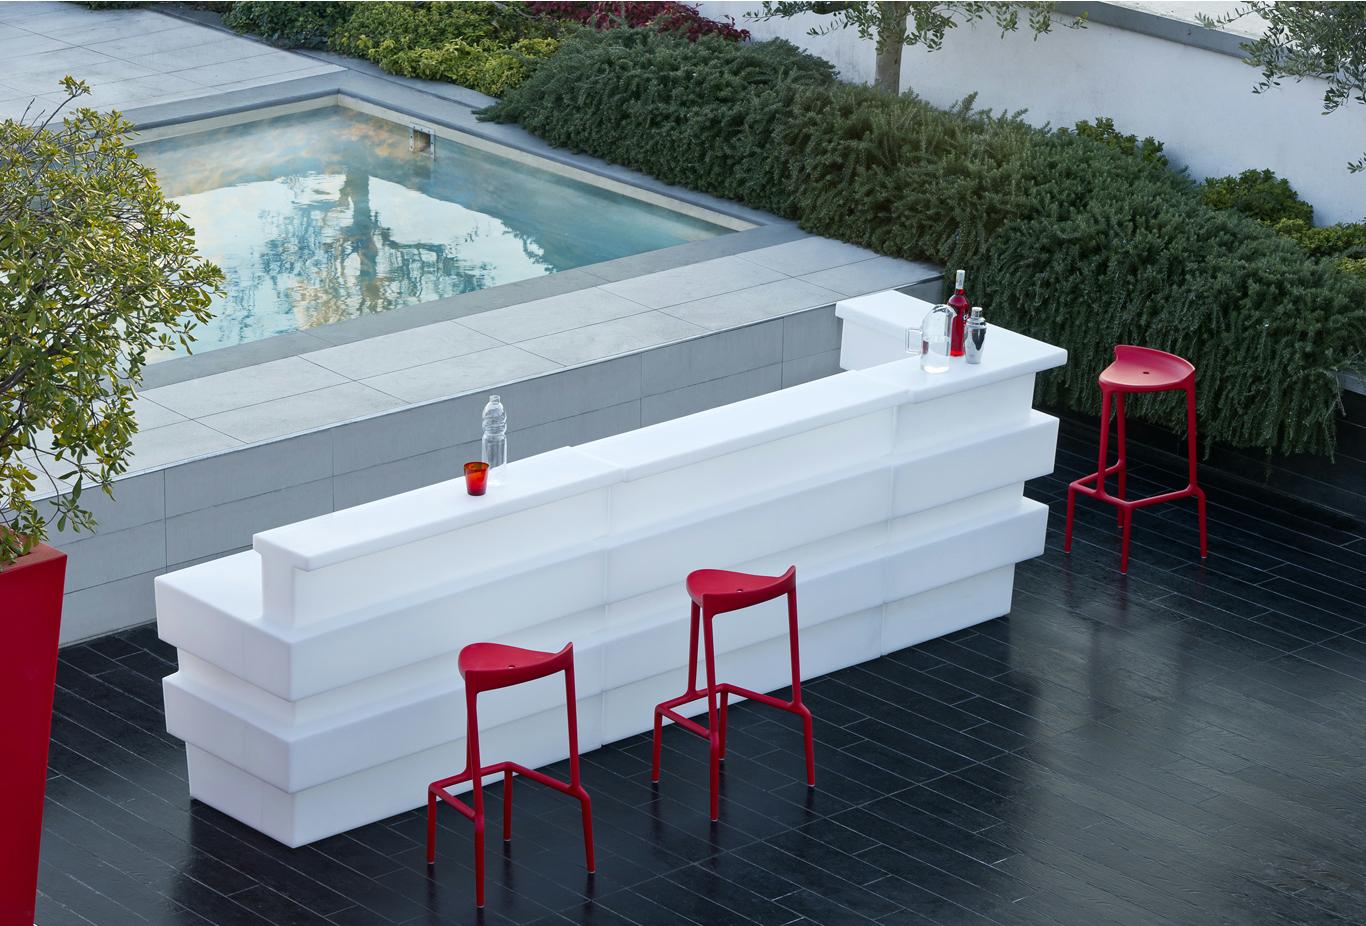 Location de bar corner tetris lumineux location mobilier for Ambienti esterni giardini